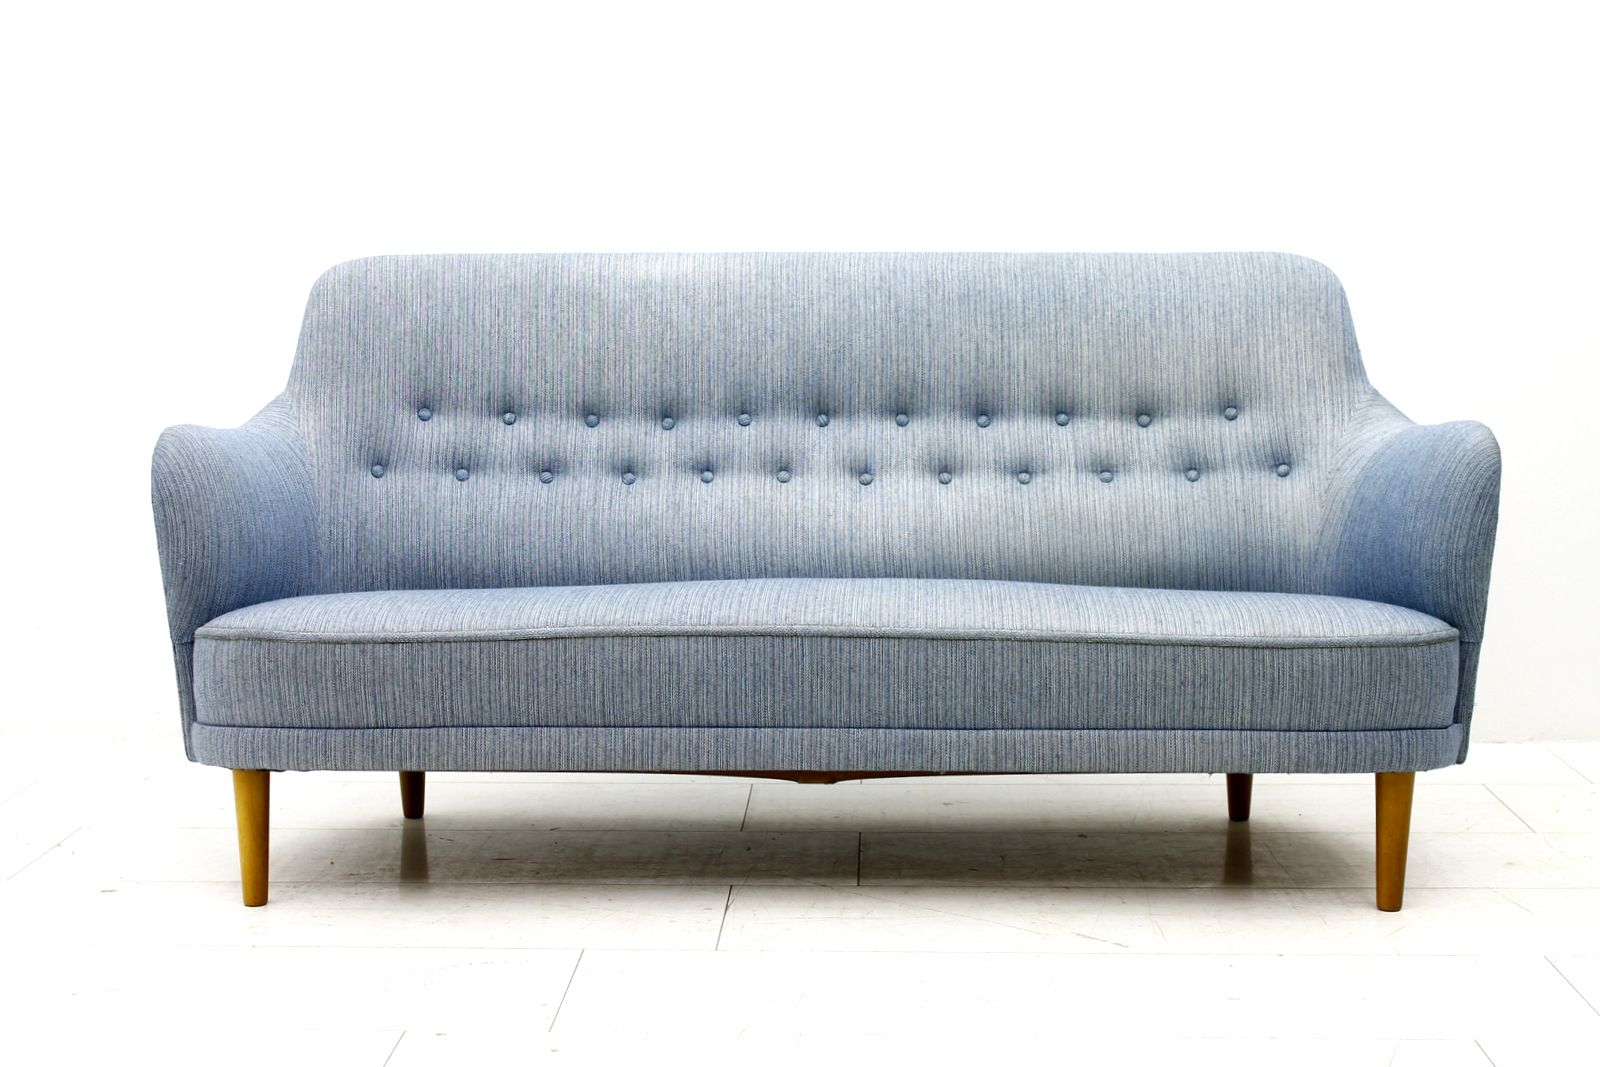 Mid Century Swedish Sofa From Carl Malmsten 1940s For